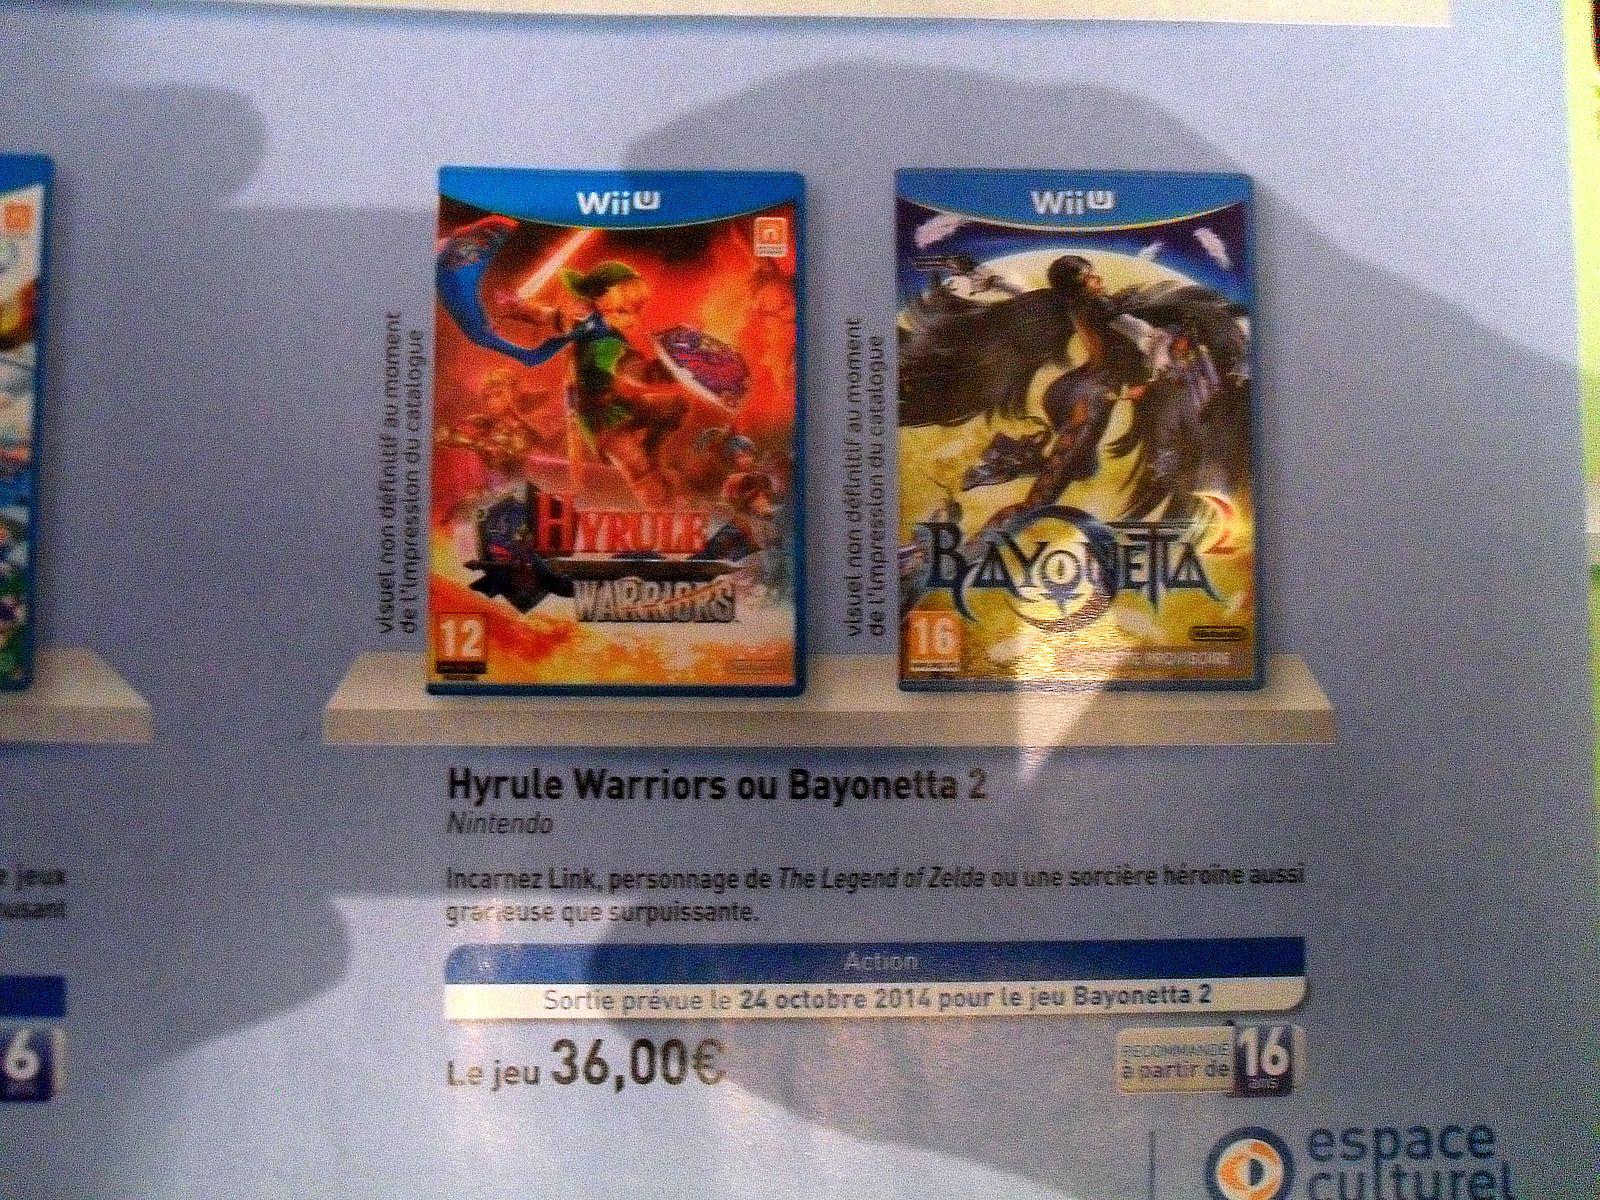 Hyrule Warrior ou Bayonetta 2 sur Wii U, l'unité